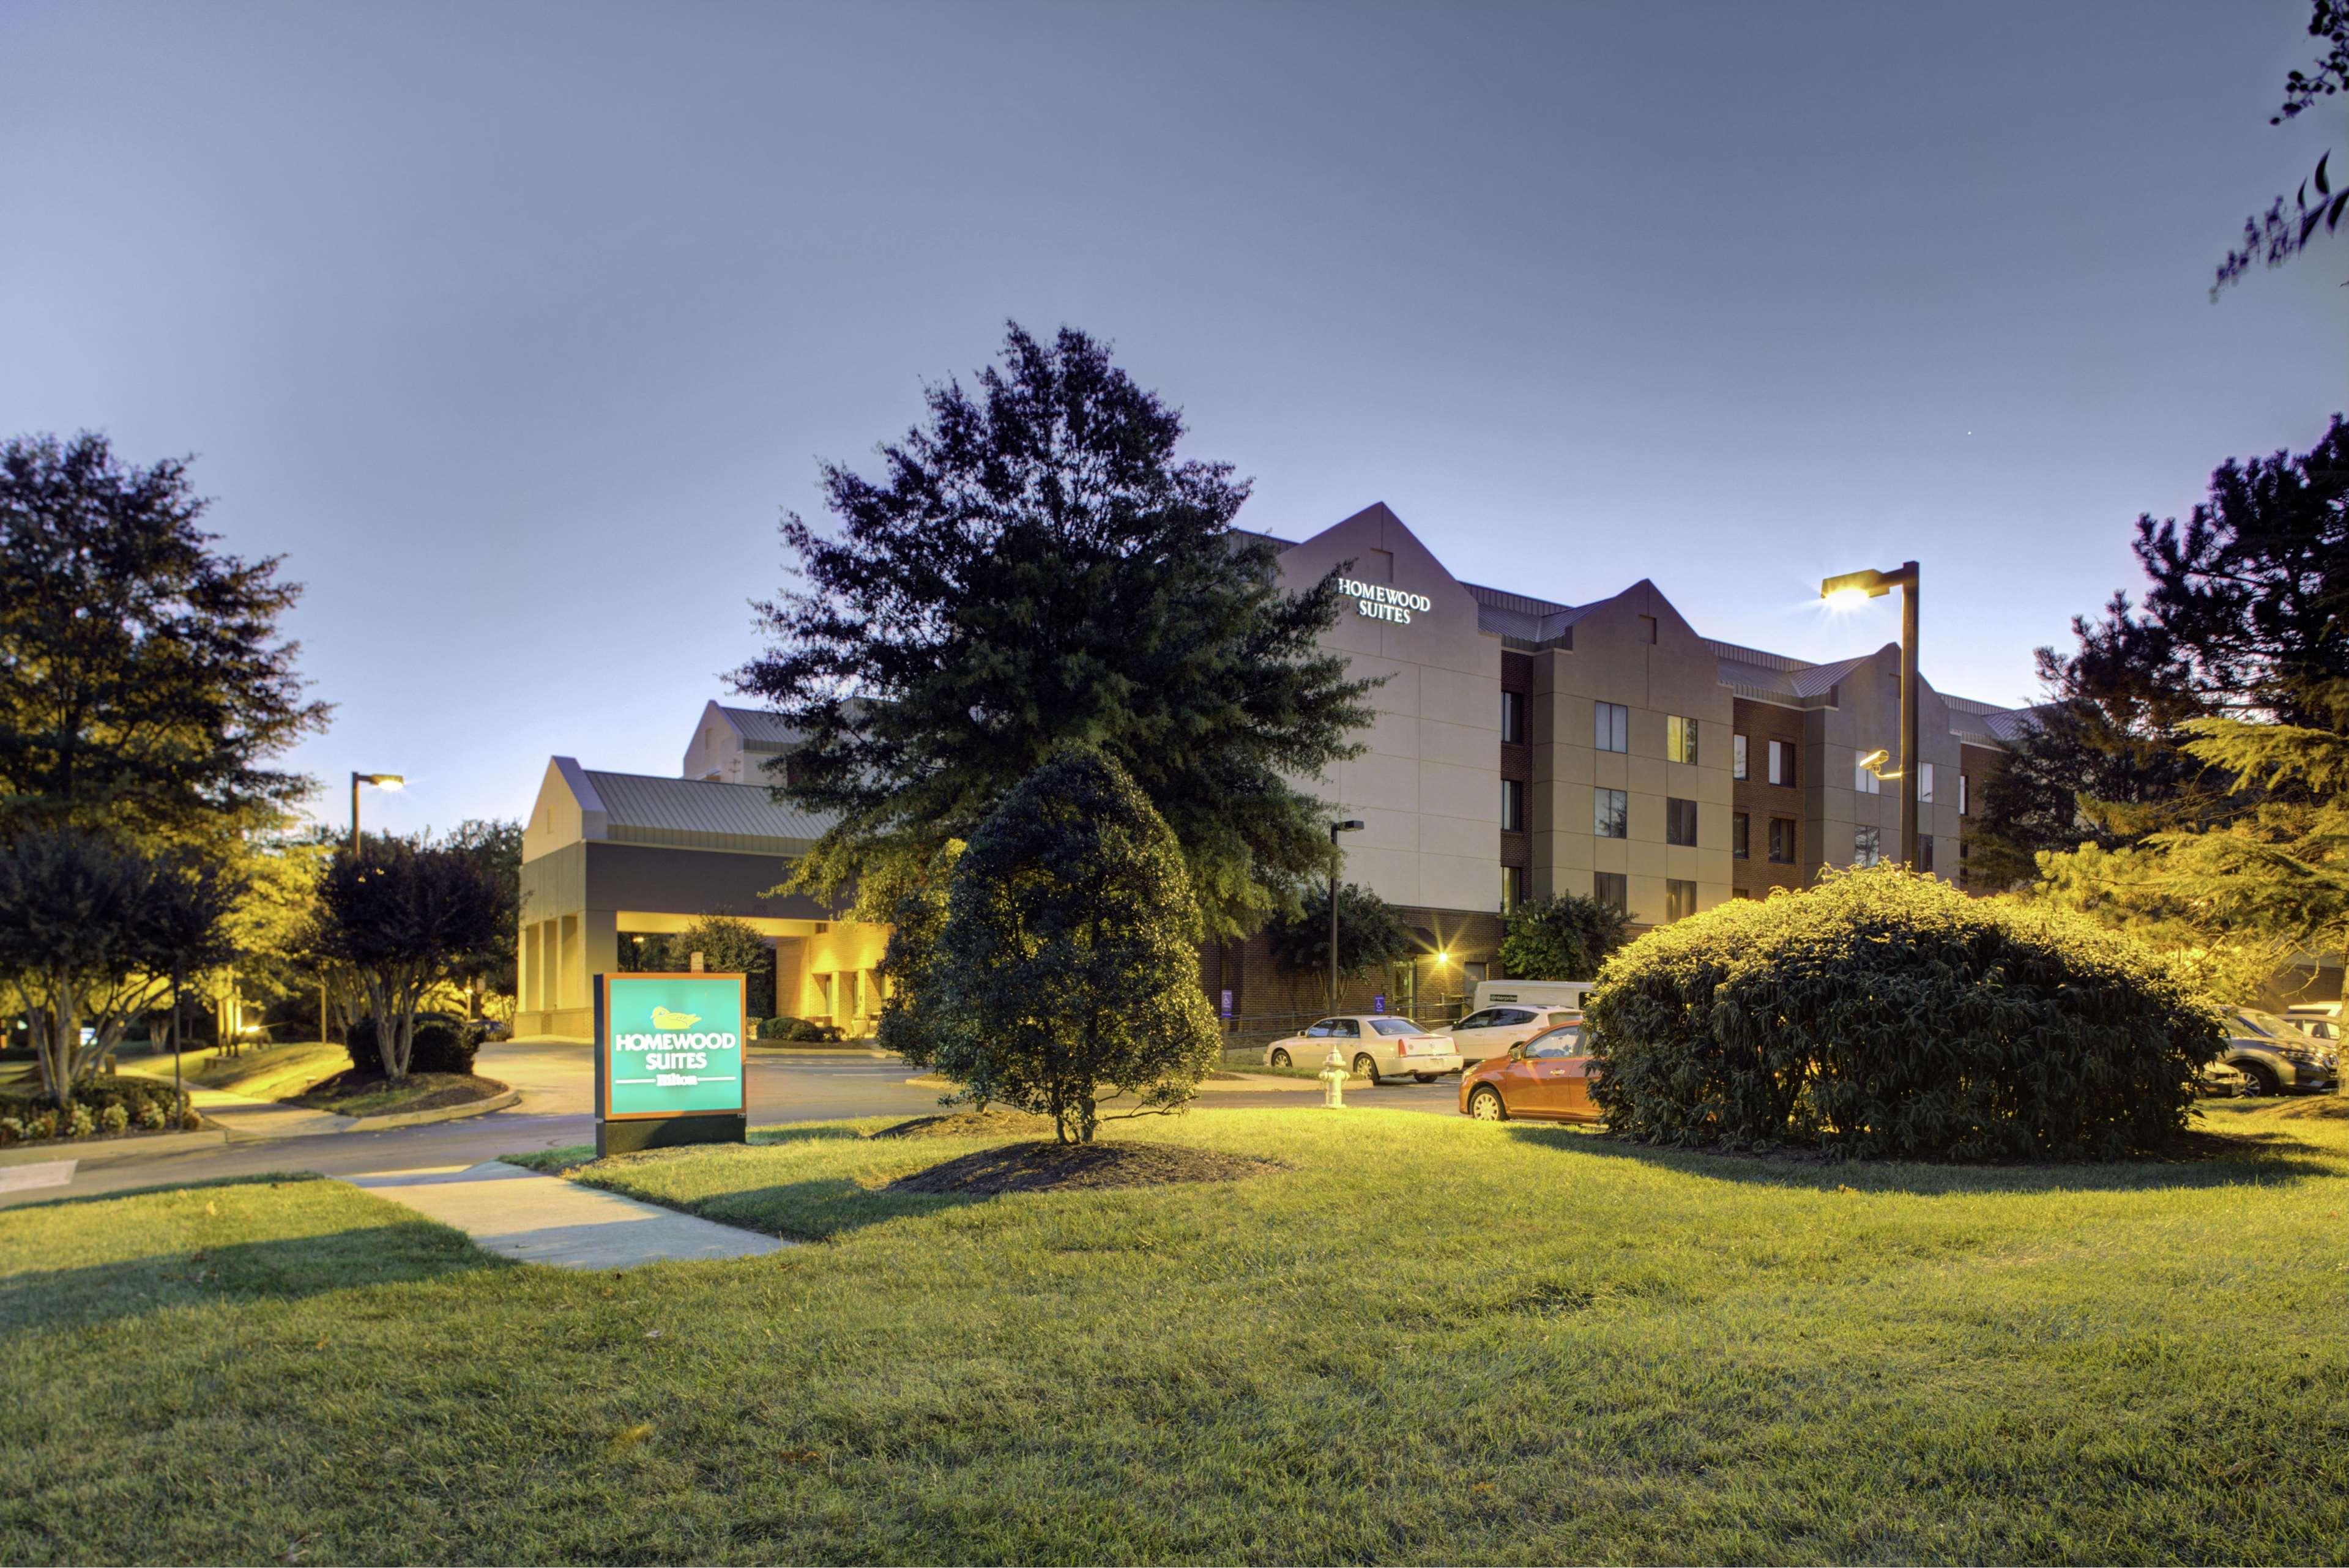 Homewood Suites by Hilton Richmond-West End/Innsbrook image 2